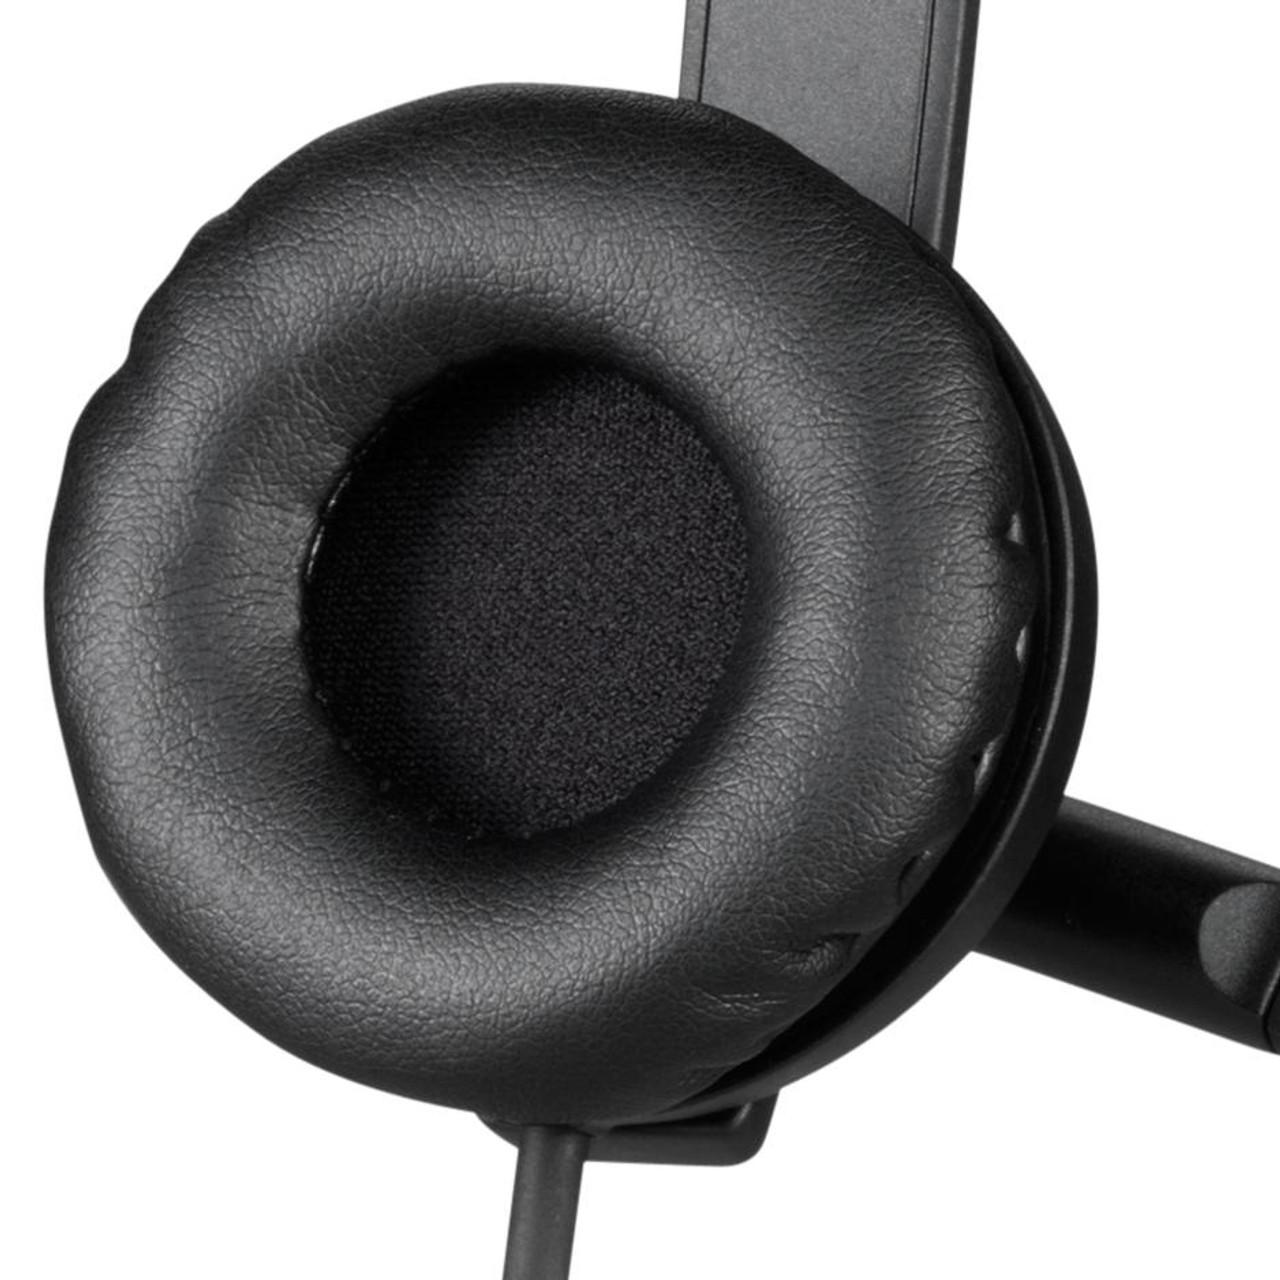 4898b793c2e Logitech USB Headset Stereo H570e  Logitech H570e leatherette ear pads